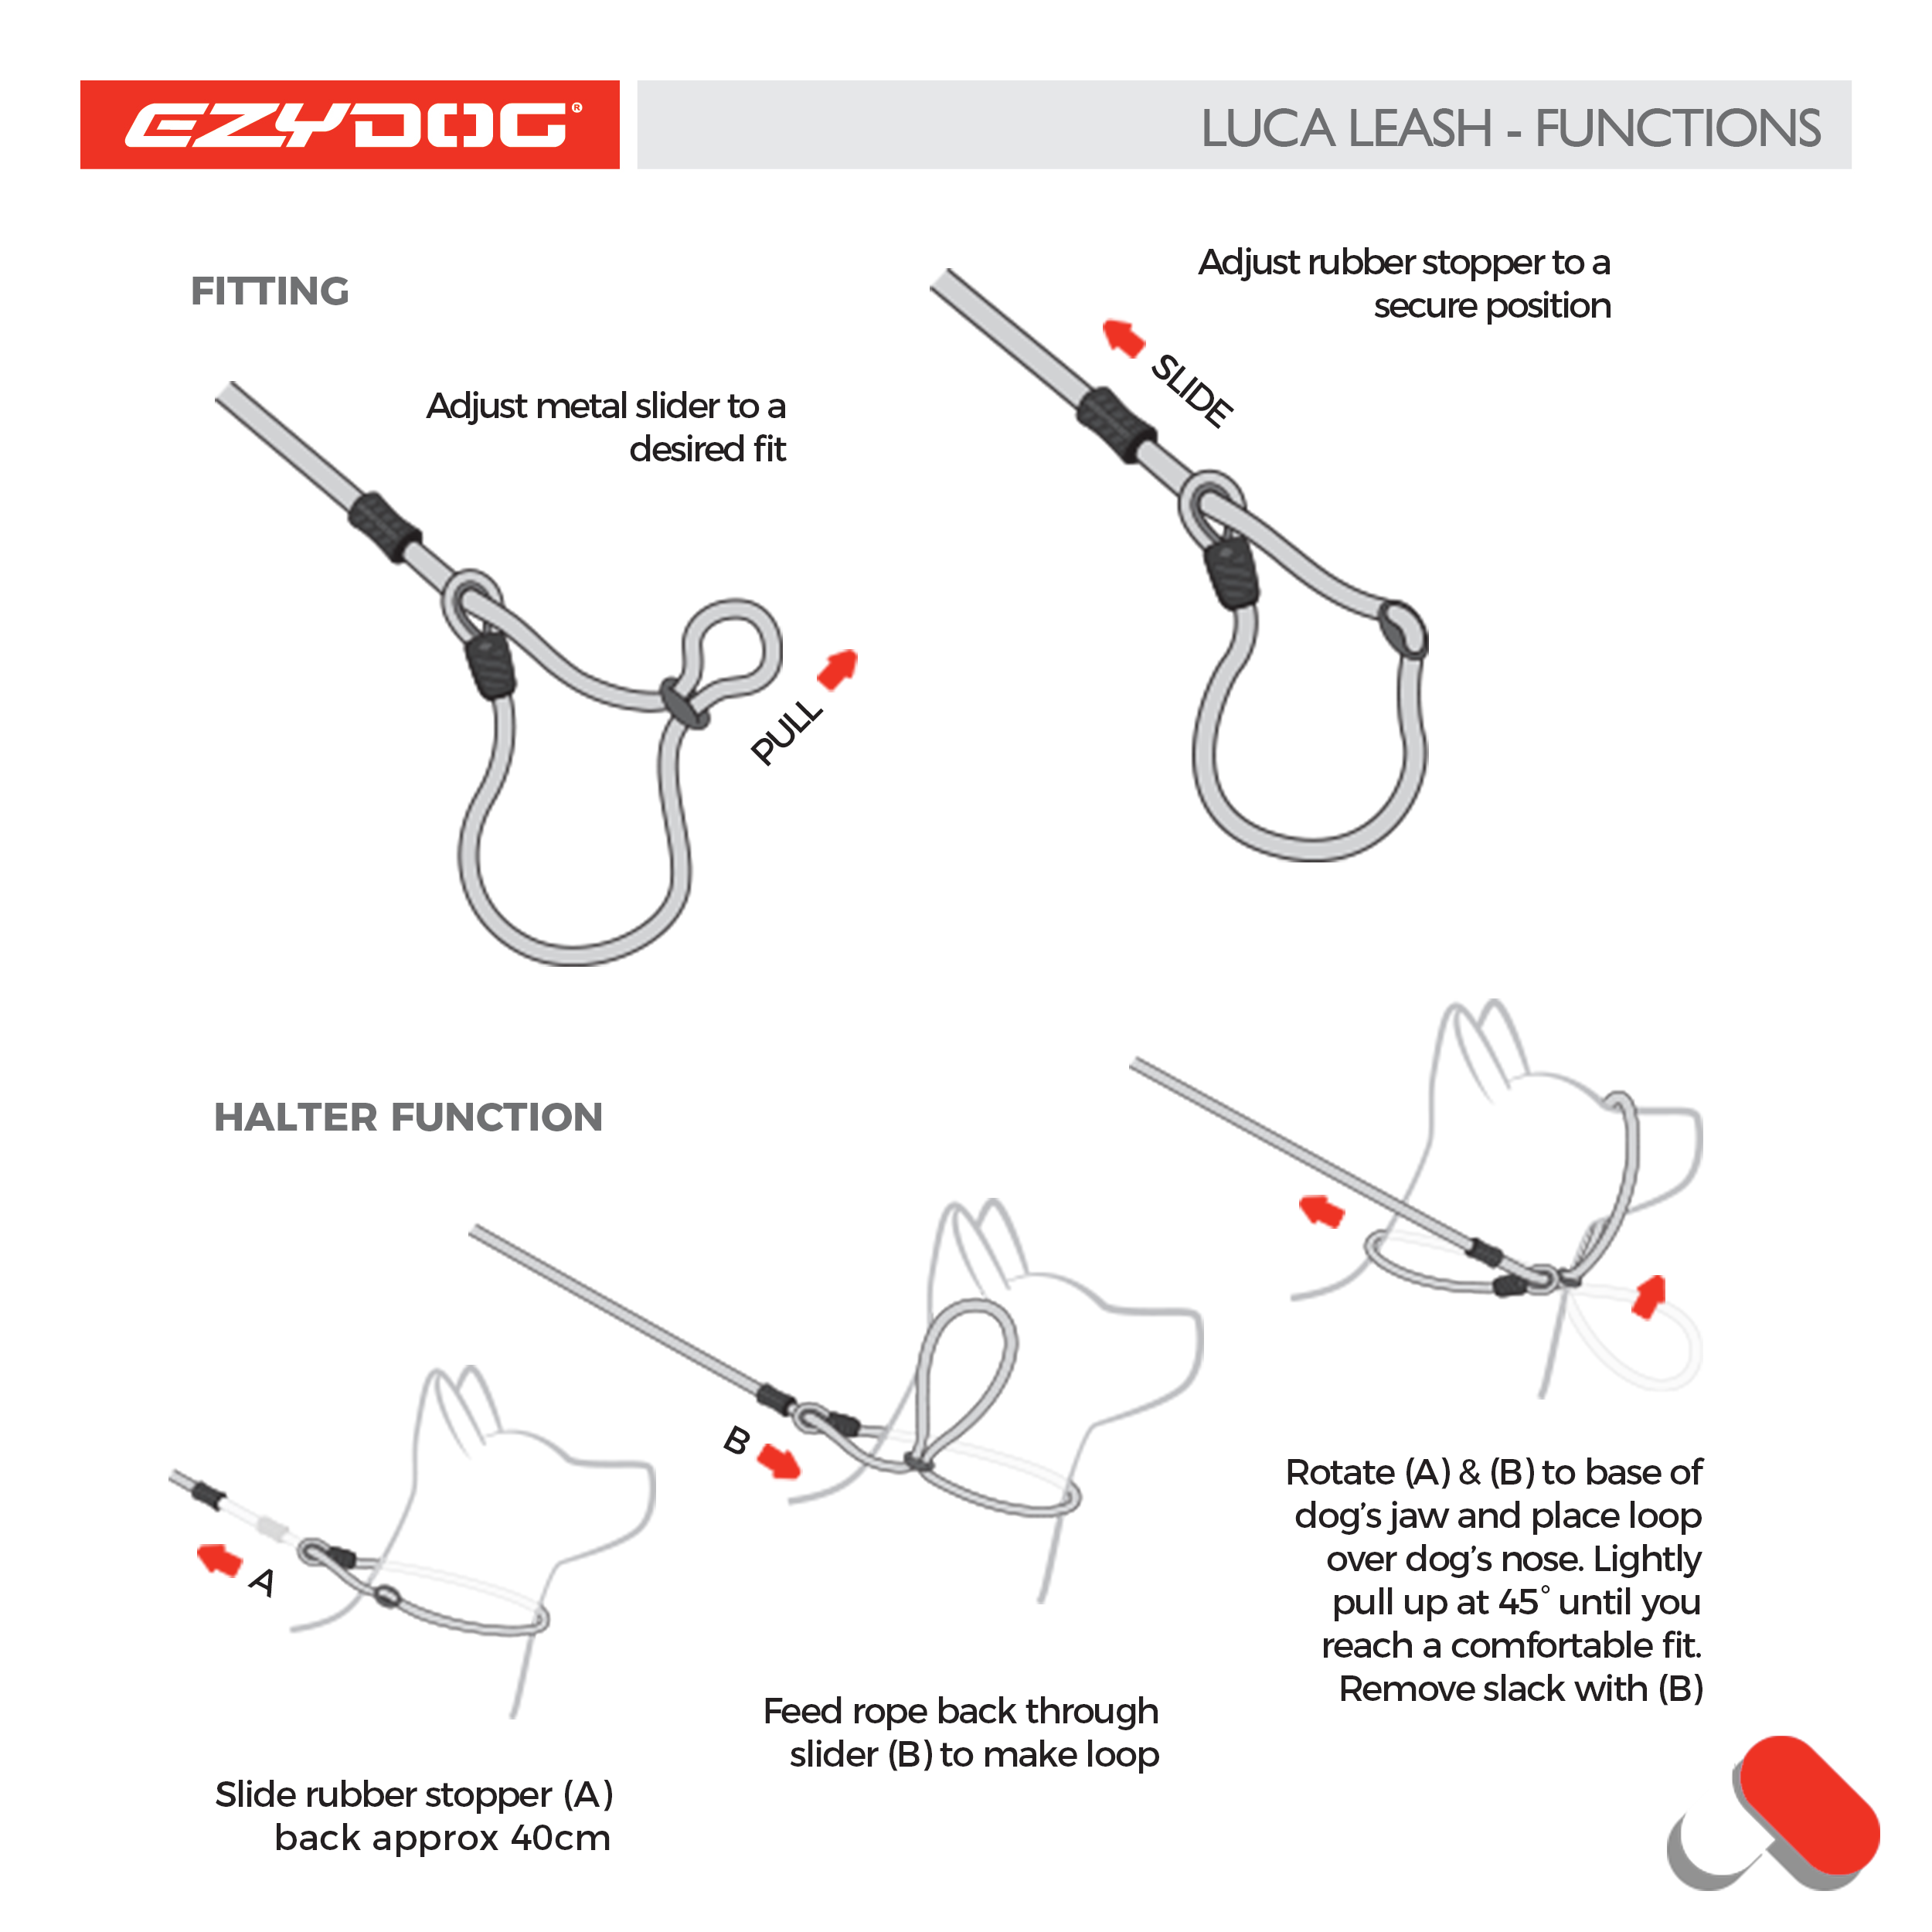 luca leash adjustment